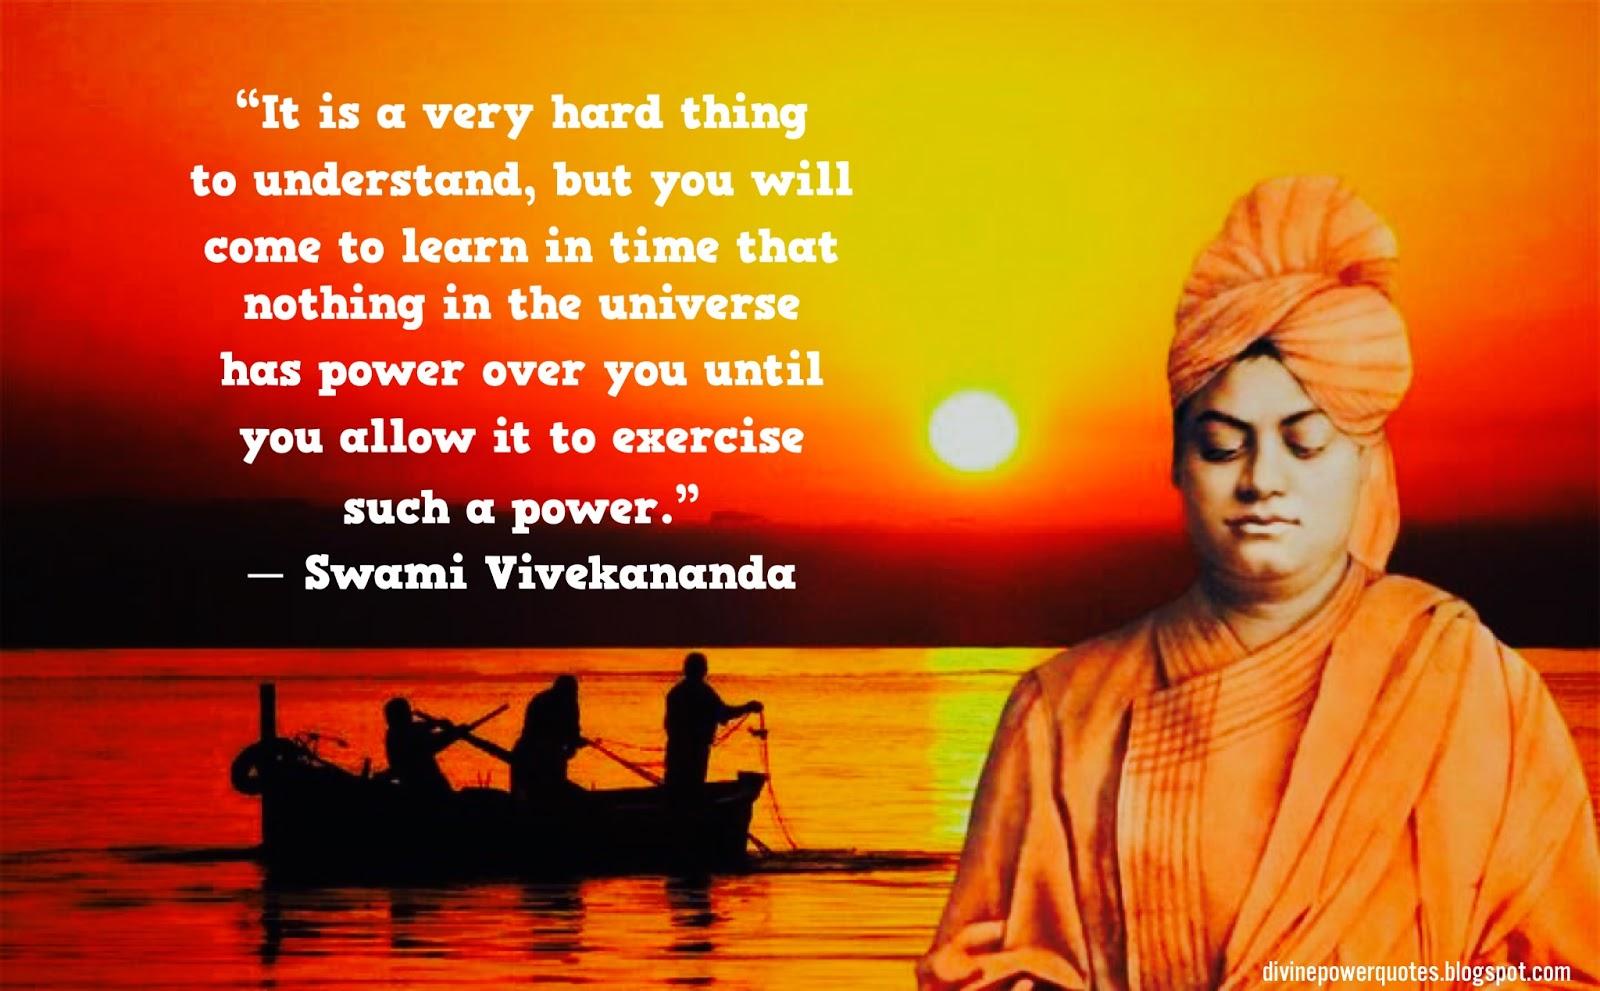 Divine Power Quotes Swami Vivekananda Quote